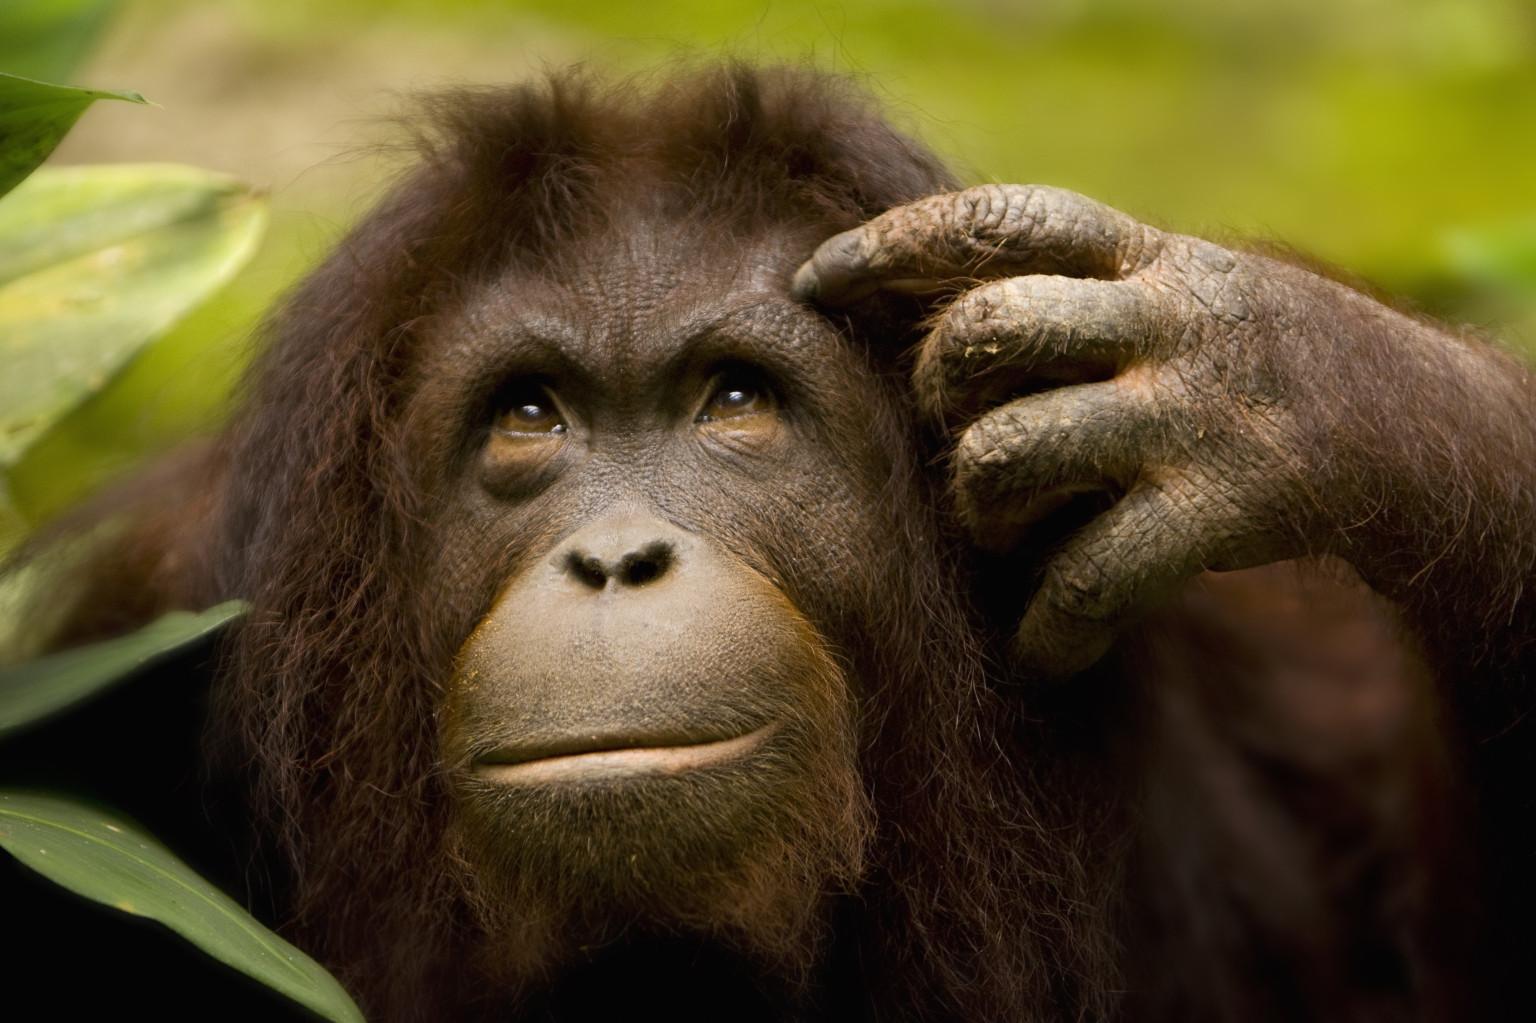 Picture of a thoughtful orangutan